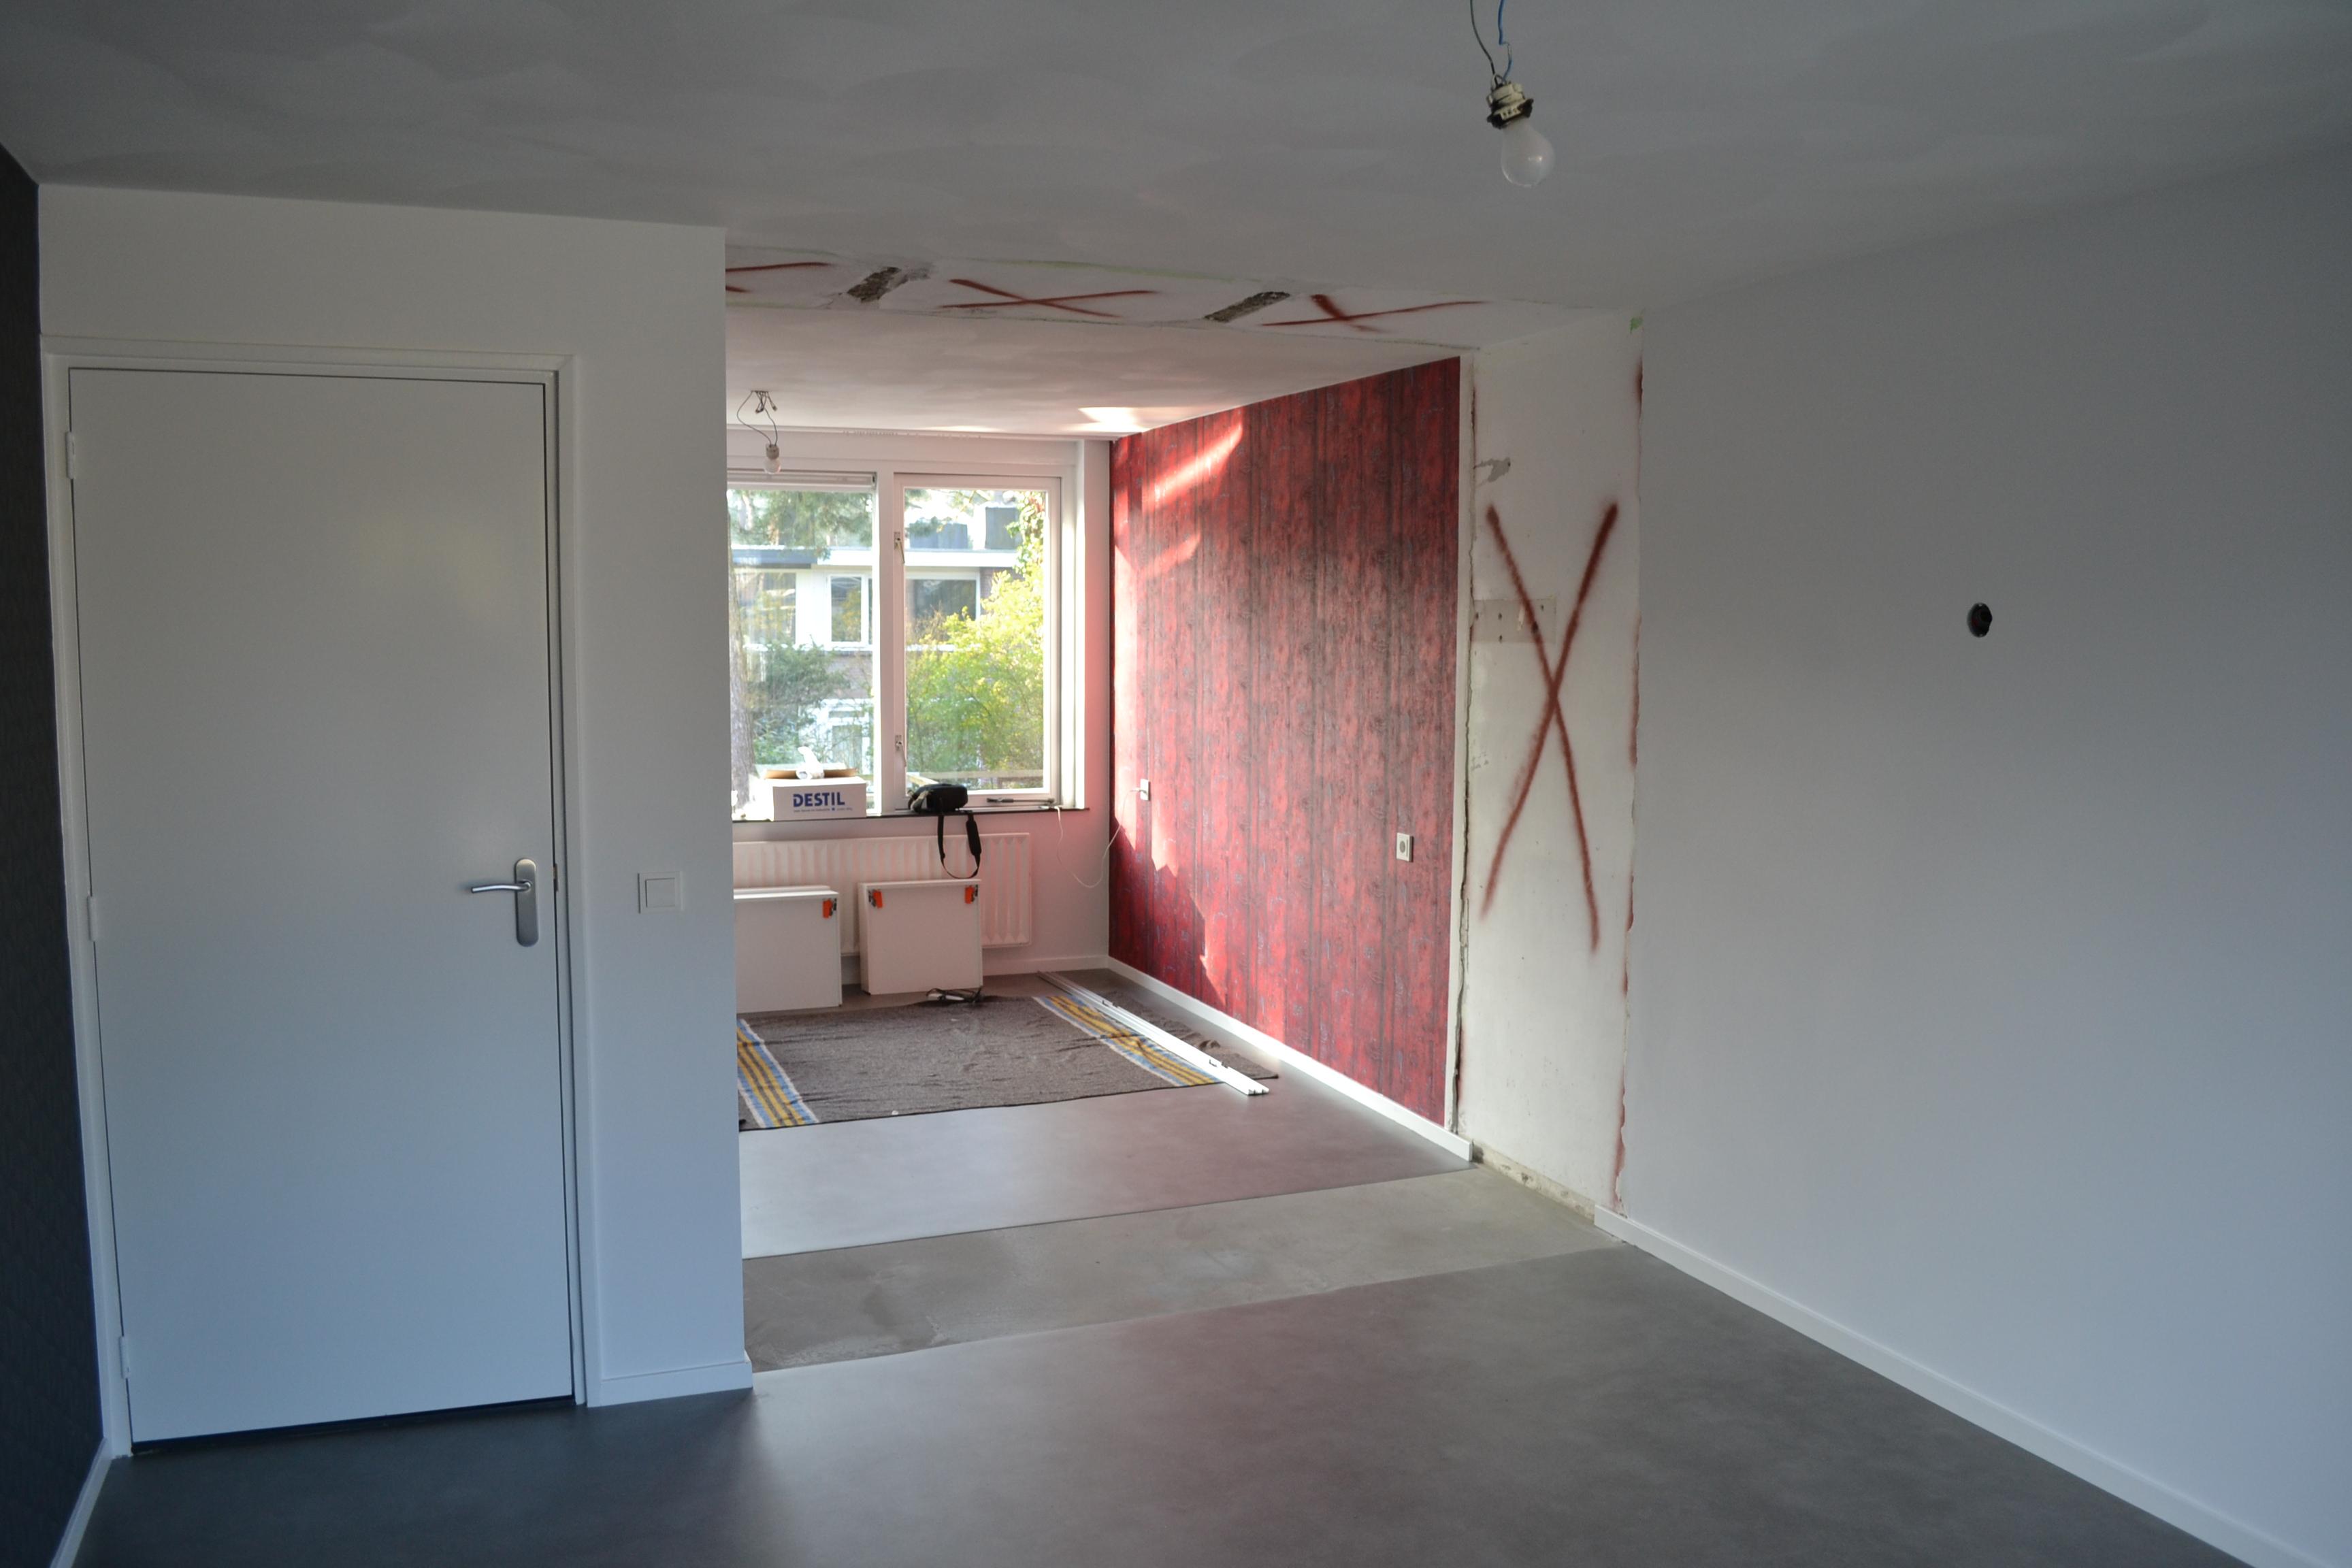 Dubbele inbouw kledingkast pdi interieurbouw - Kledingkast en dressoir ...